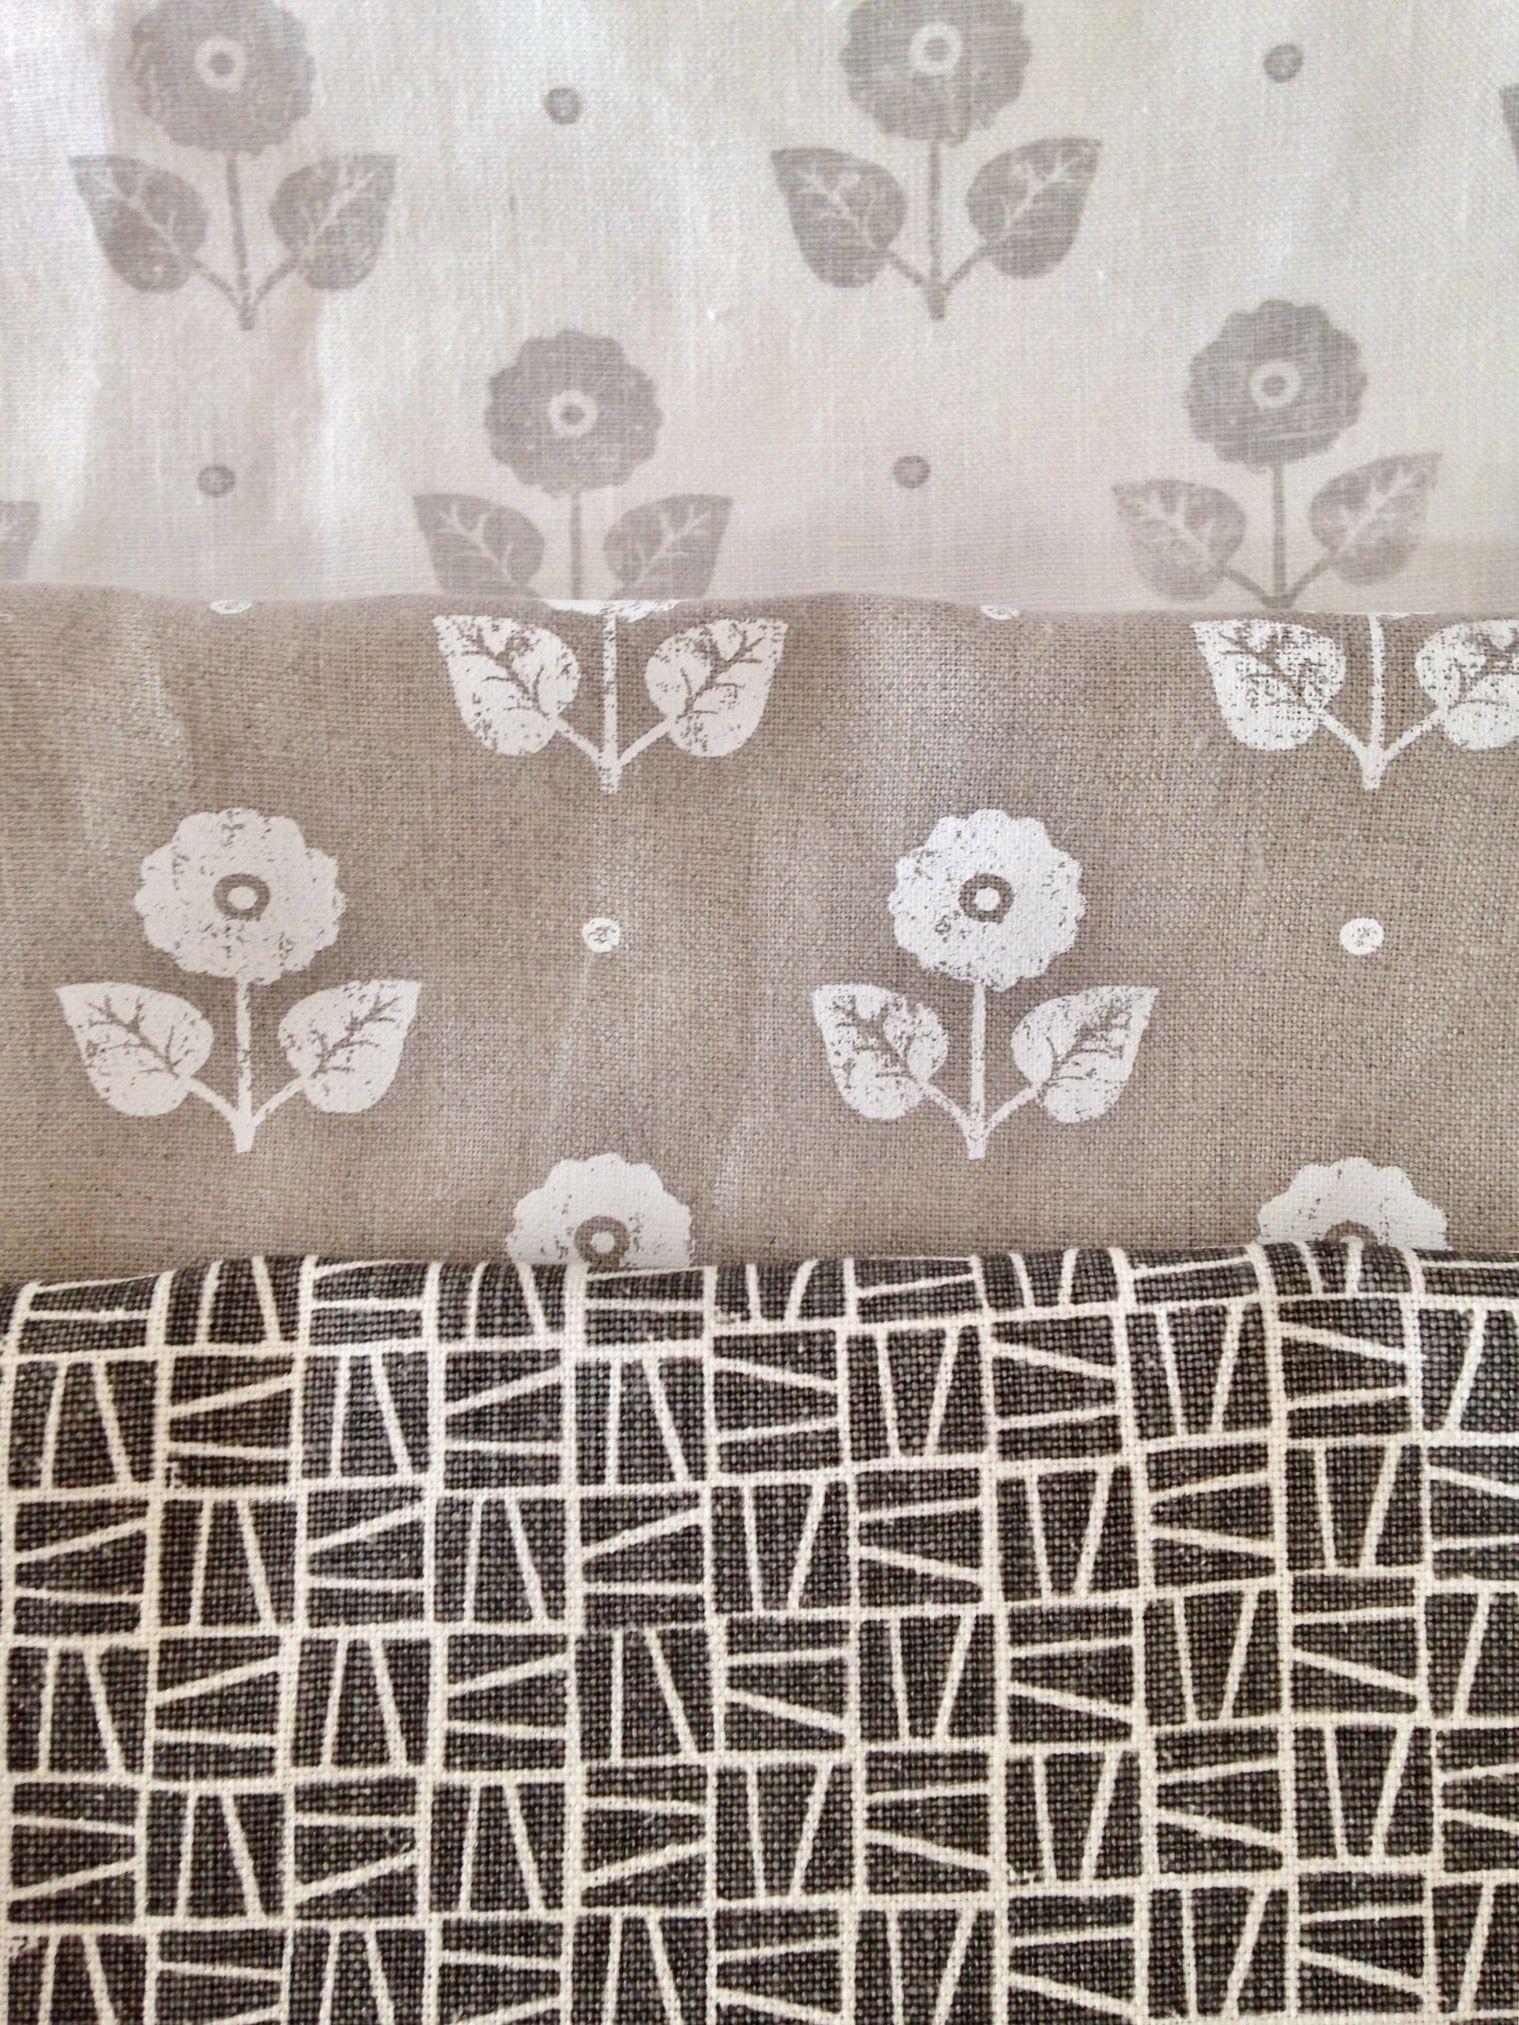 Hand silkscreened fabrics by Lindsay Alker wwwlindsayalkercom 1519x2025